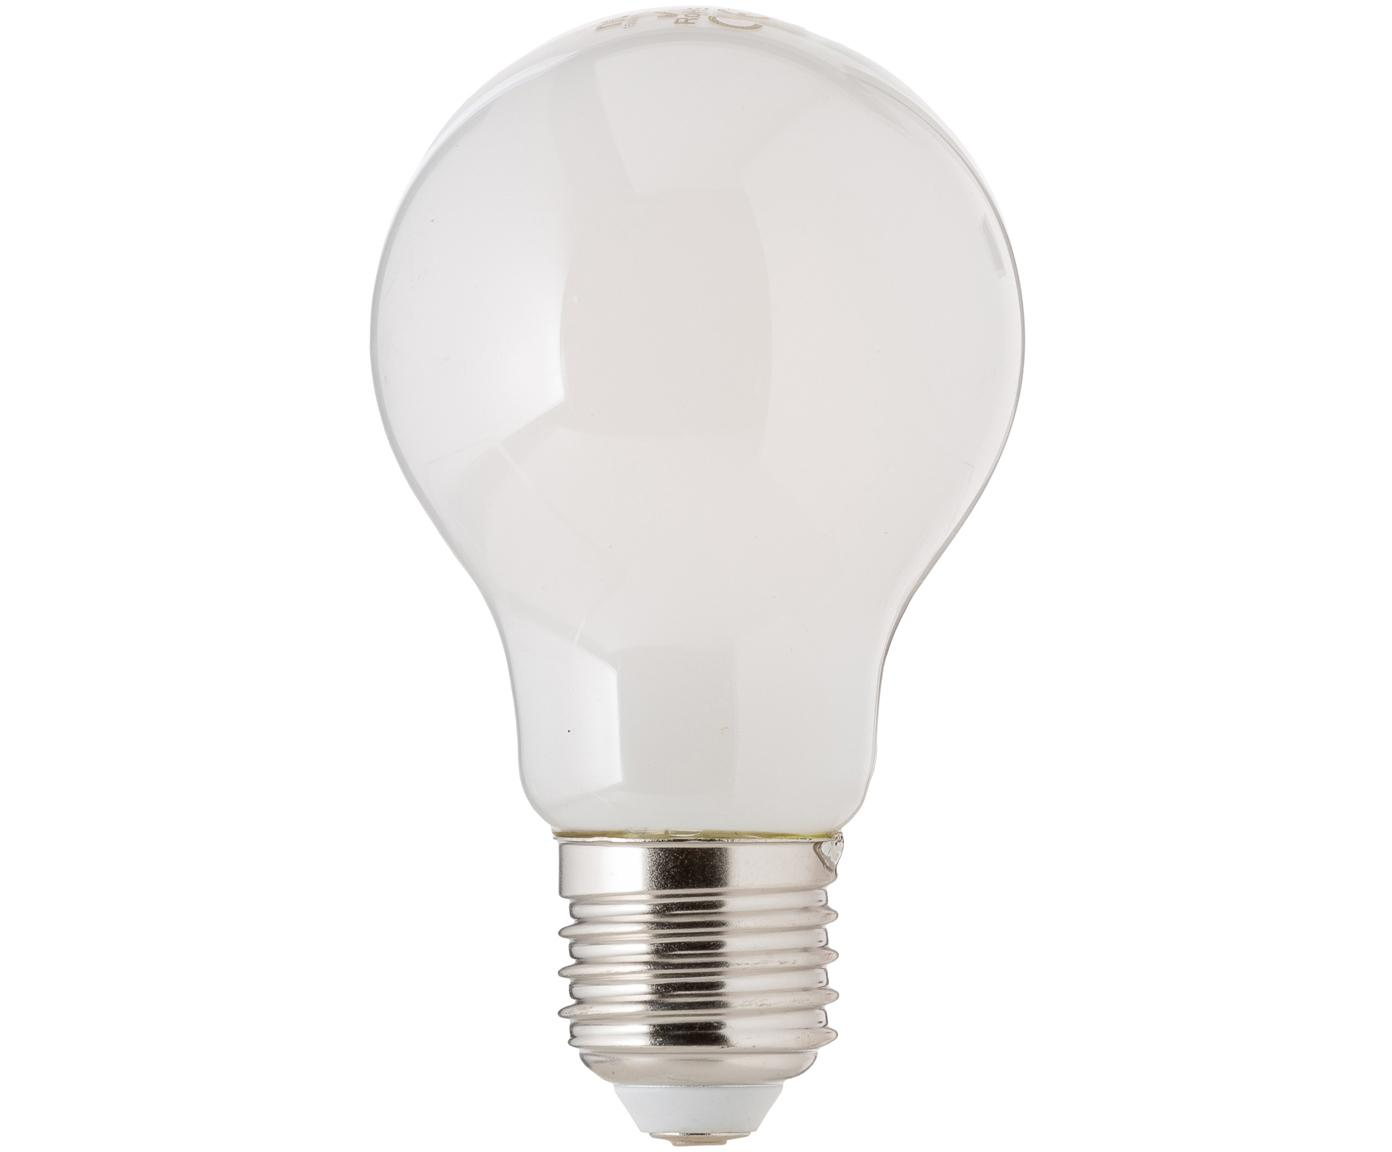 Lampadina a Heal (E27 / 4Watt) 5 pz., Paralume: vetro opale, Base lampadina: alluminio, Bianco, Ø 8 x Alt. 10 cm